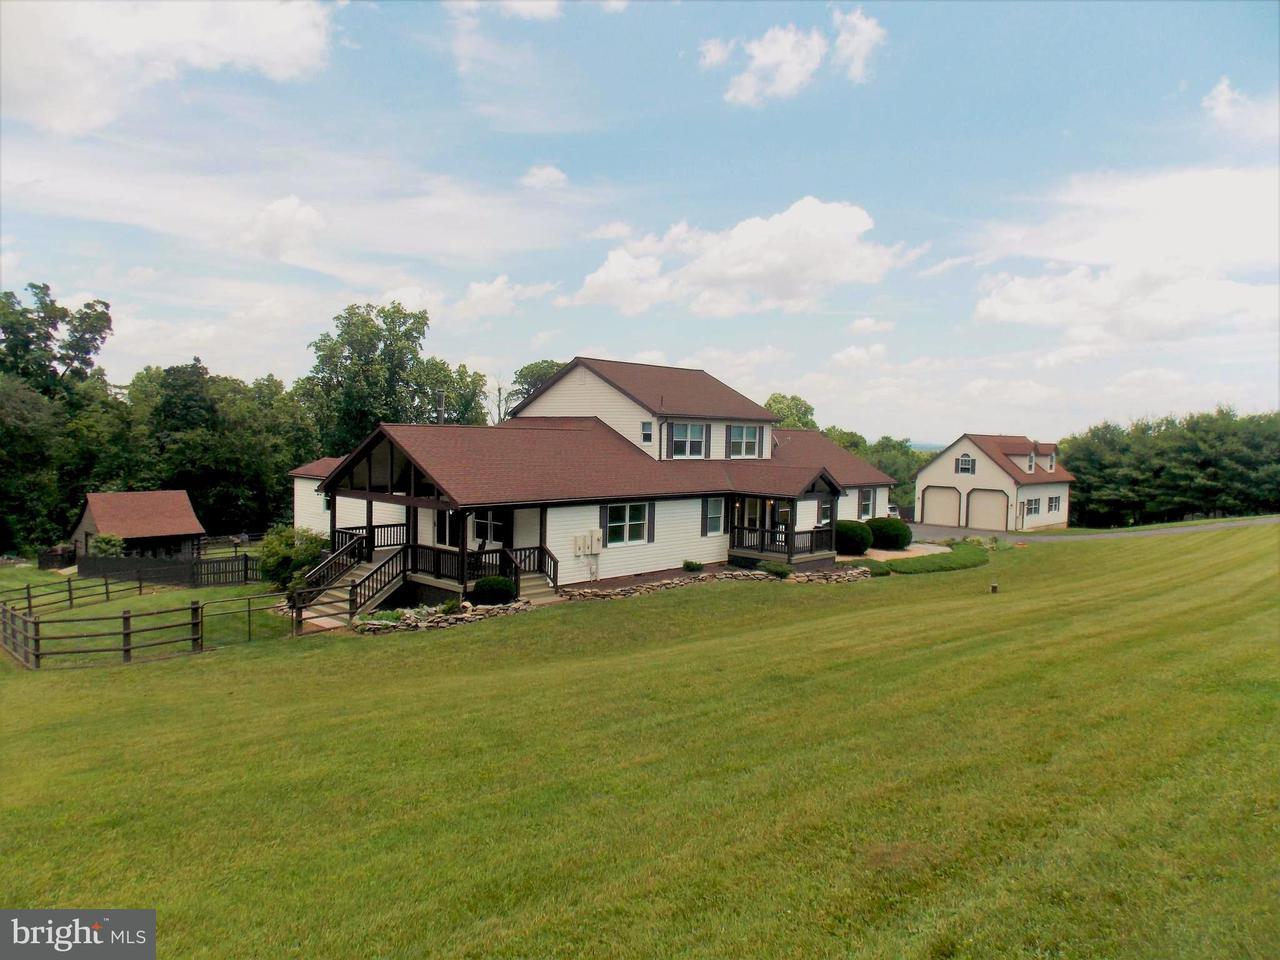 Single Family Home for Sale at 975 Mount Carmel Road 975 Mount Carmel Road Orrtanna, Pennsylvania 17353 United States